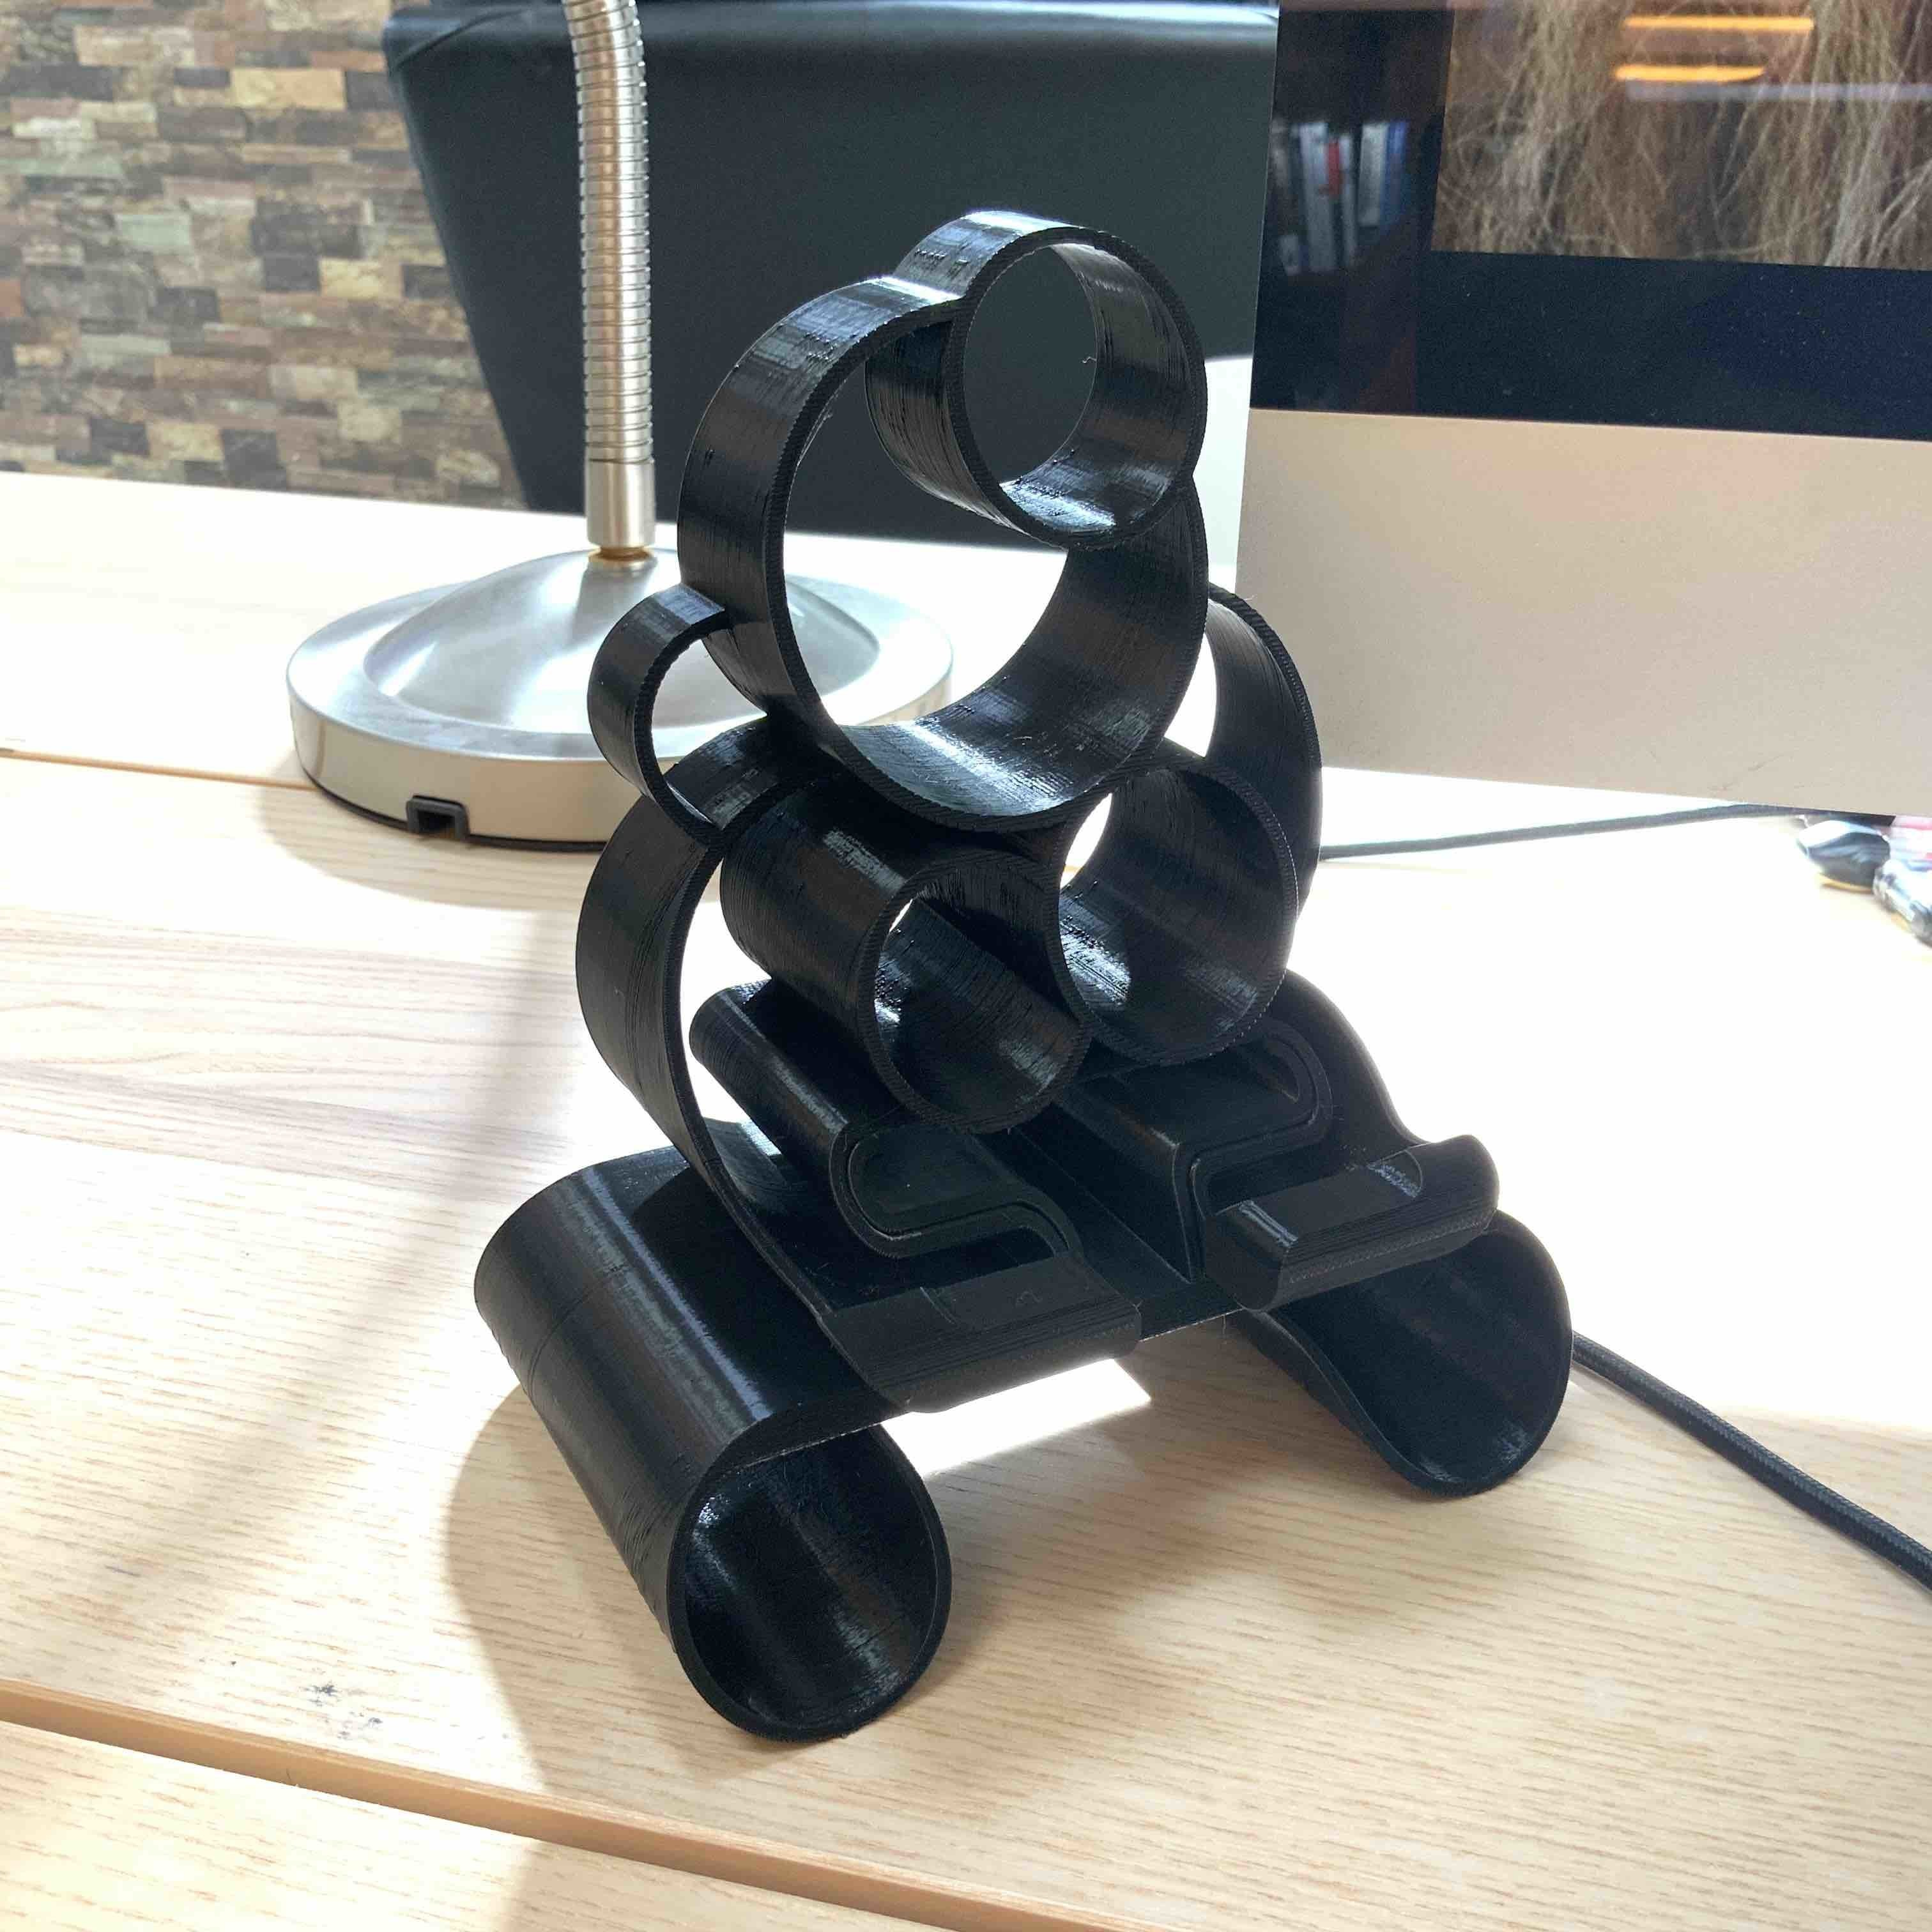 1.jpg Download free STL file Phone stand Bubbles • 3D printer template, Modellismo